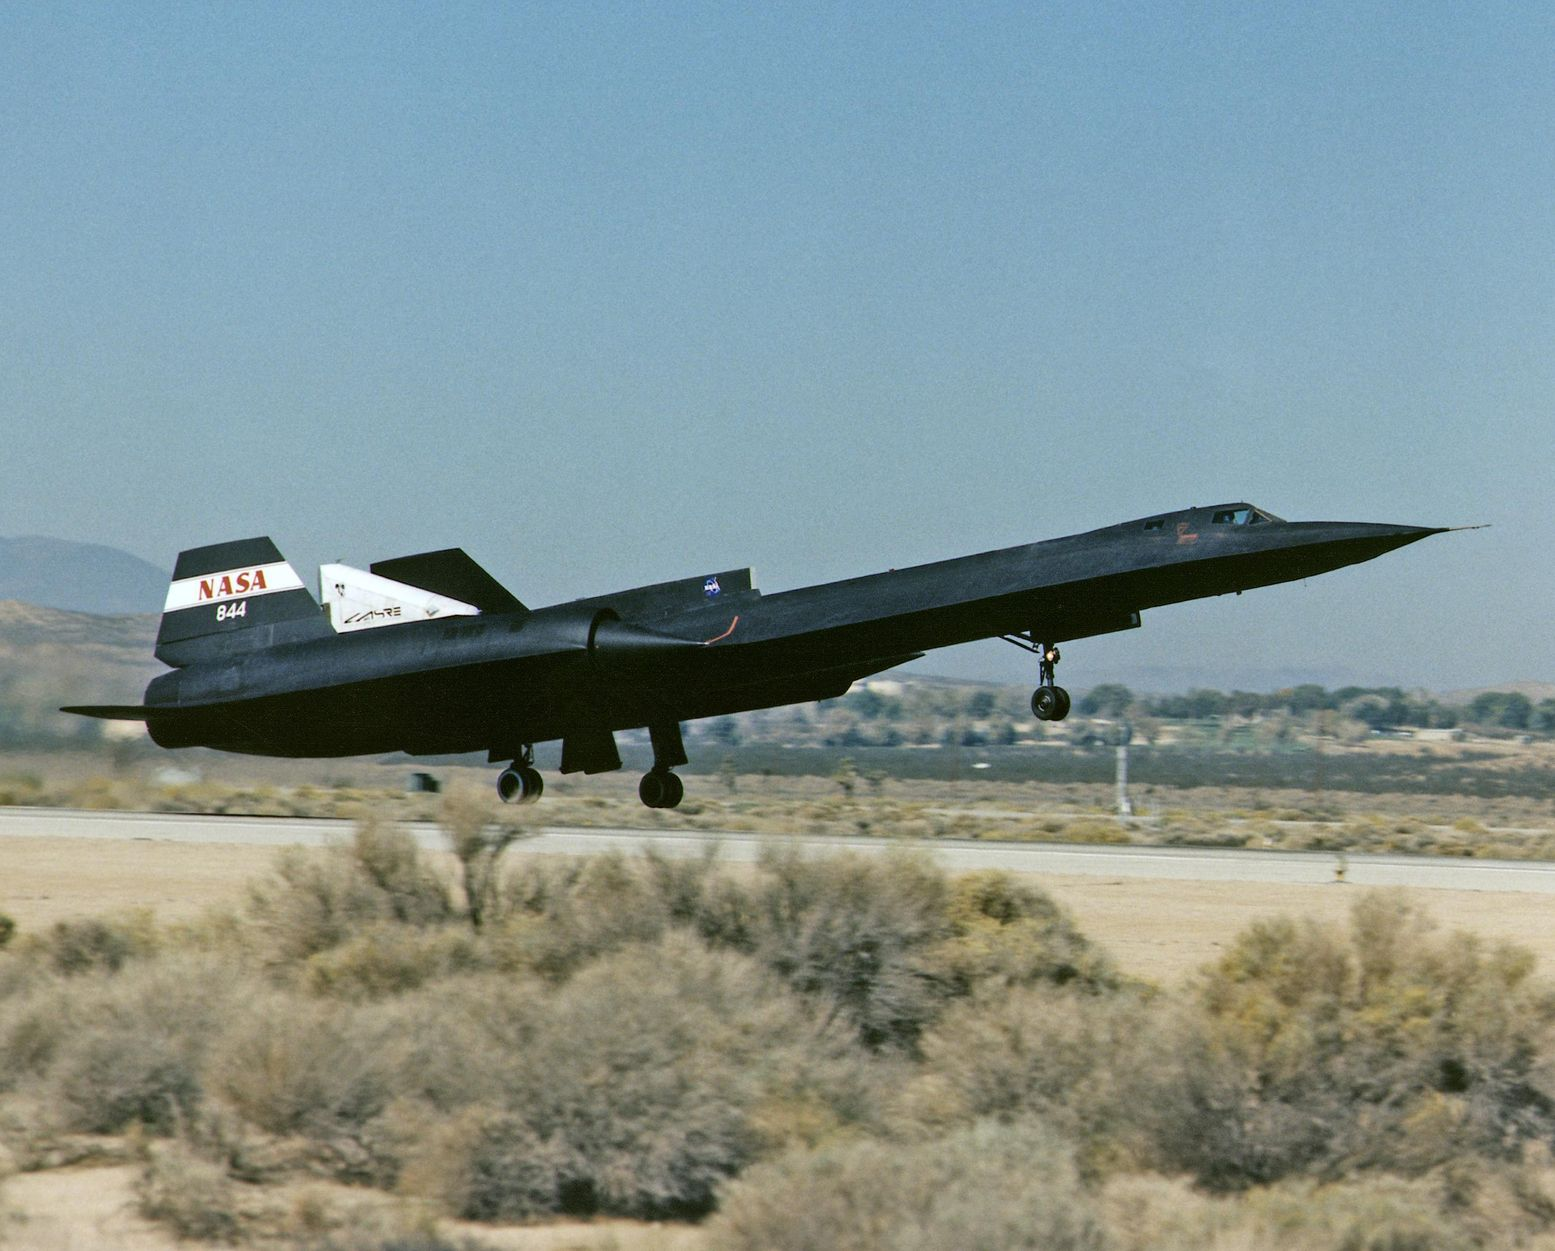 The Horrific Story of a SR-71 Blackbird Refueling Gone Wrong